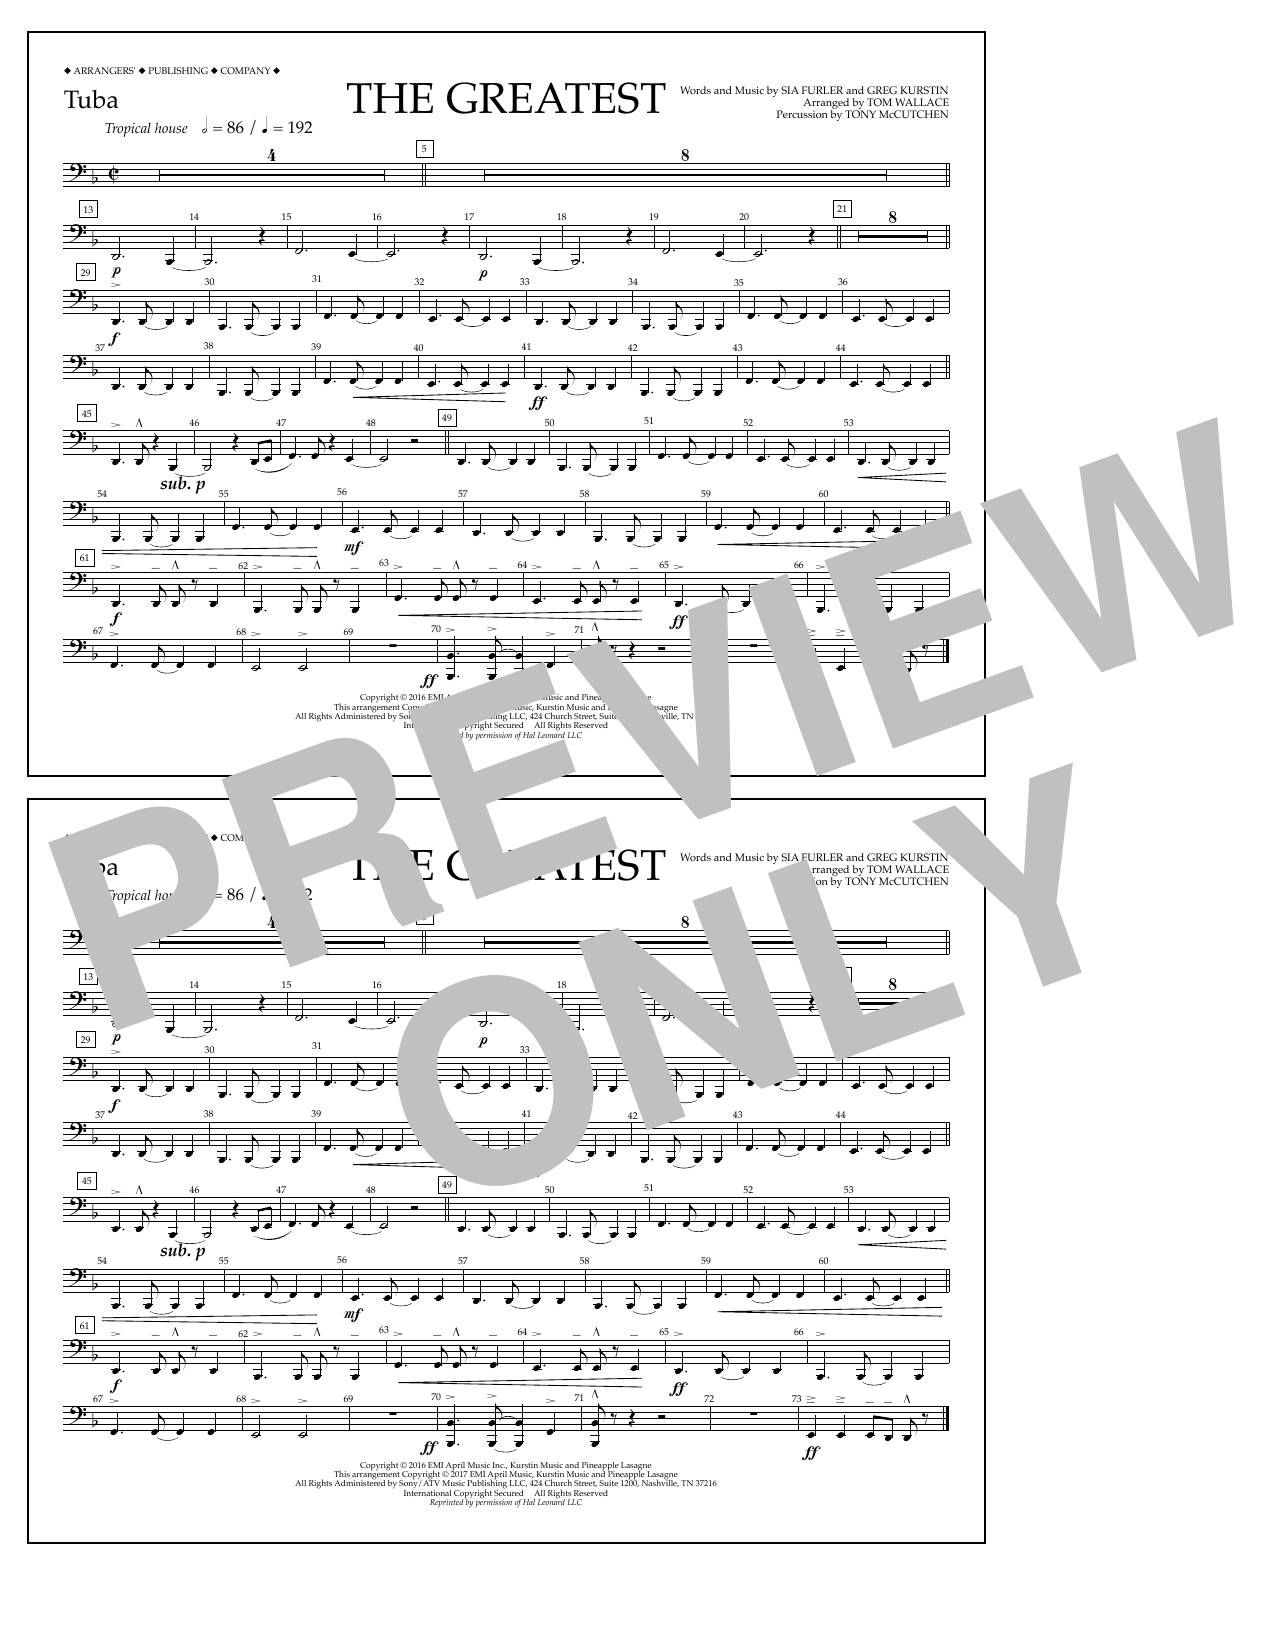 The Greatest - Tuba Sheet Music